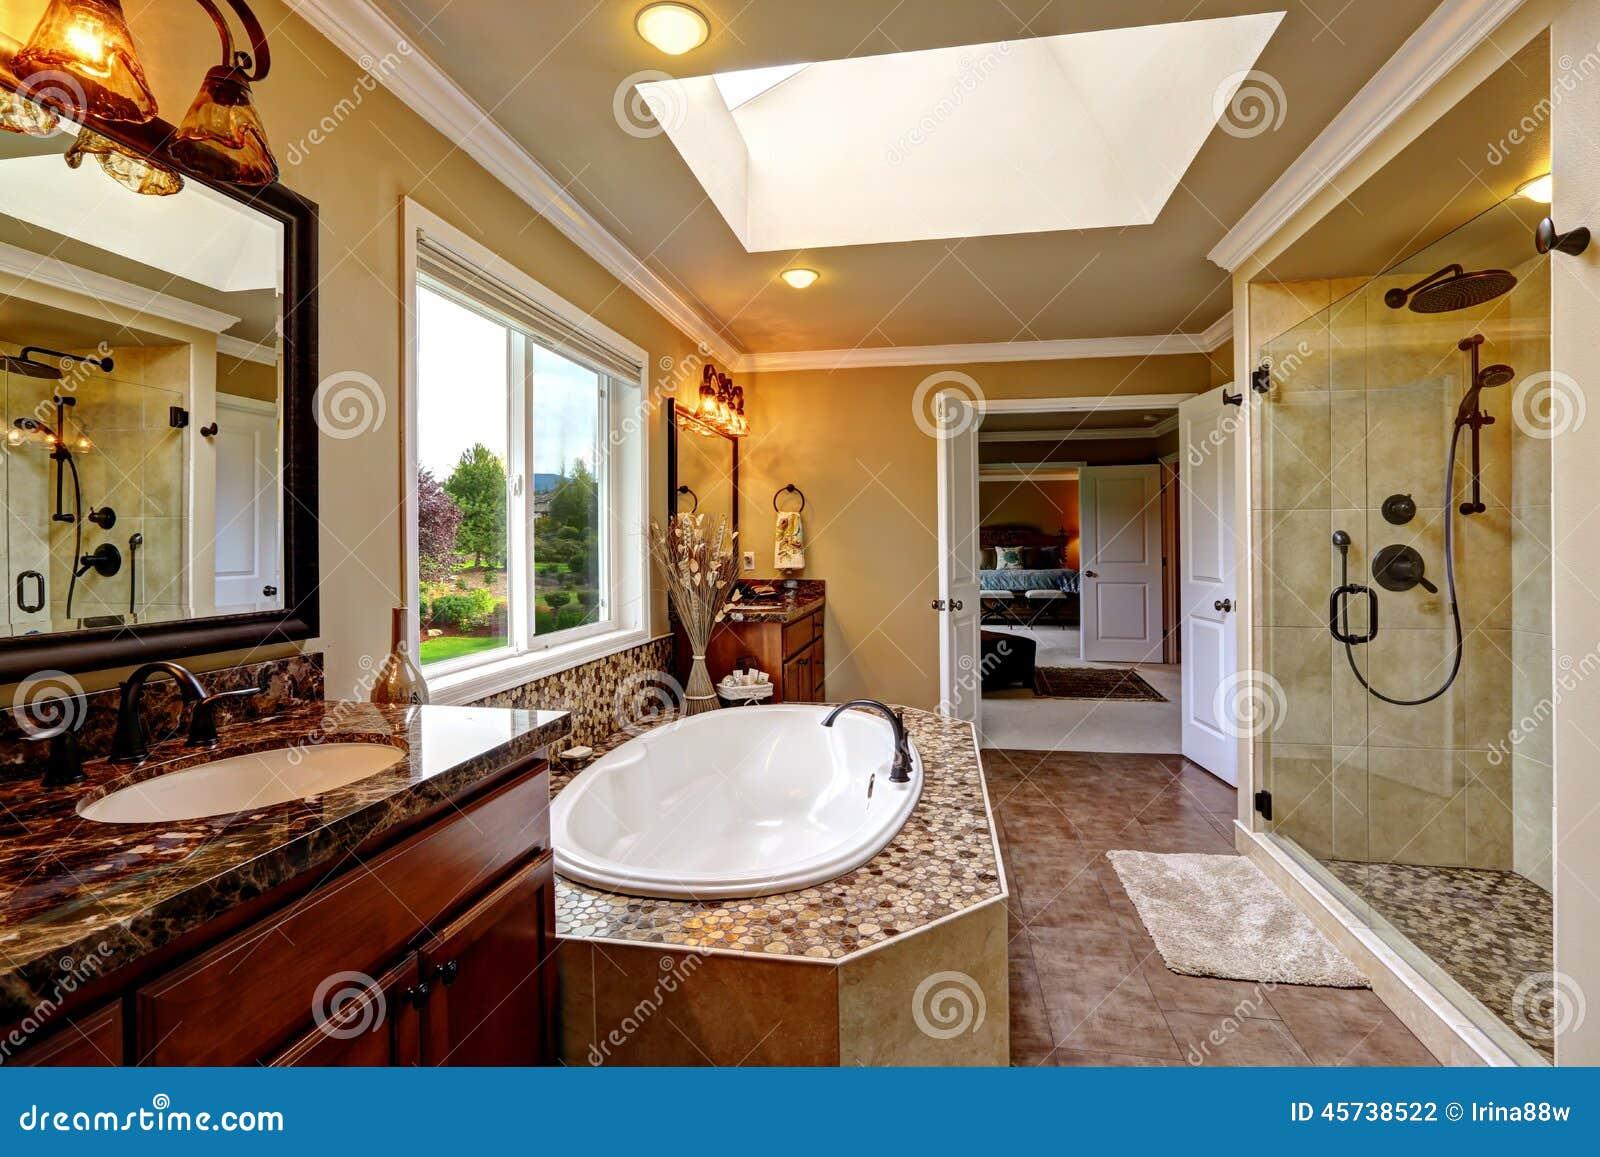 Luxury bathroom interior with bath tub and glass door - Salle de bain baignoire ...